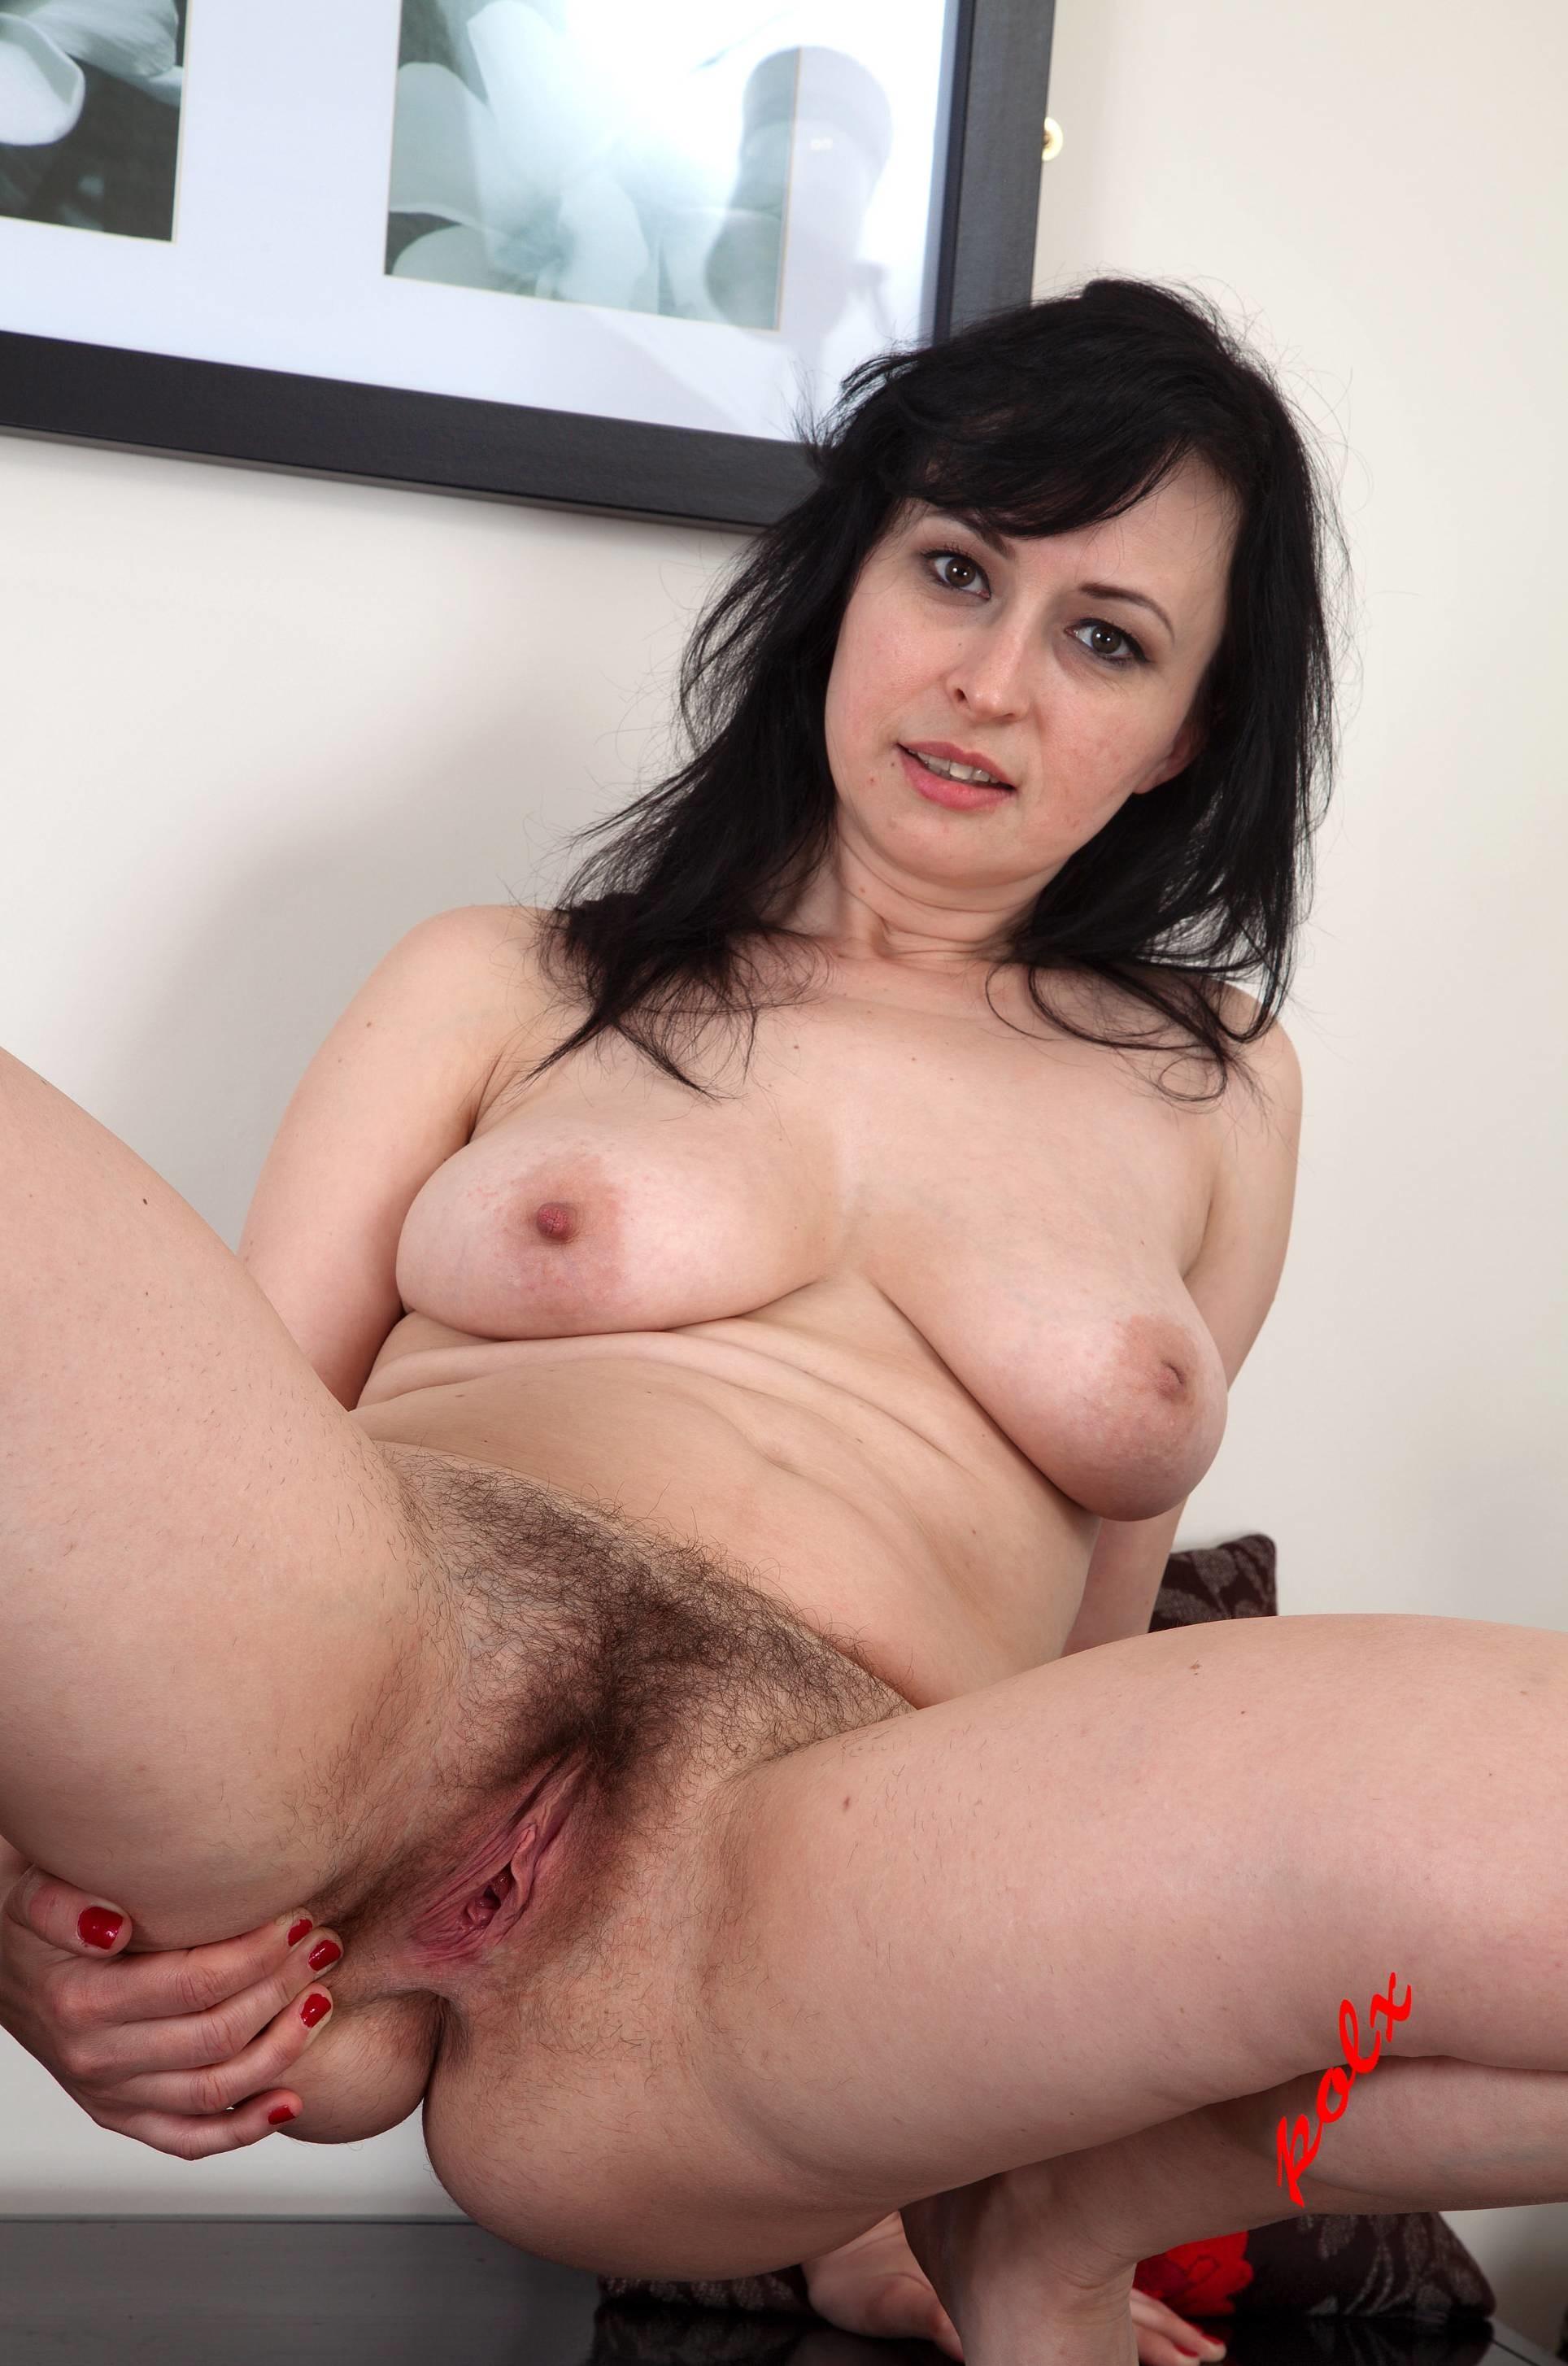 pornmoza free videos sex movies porn tube